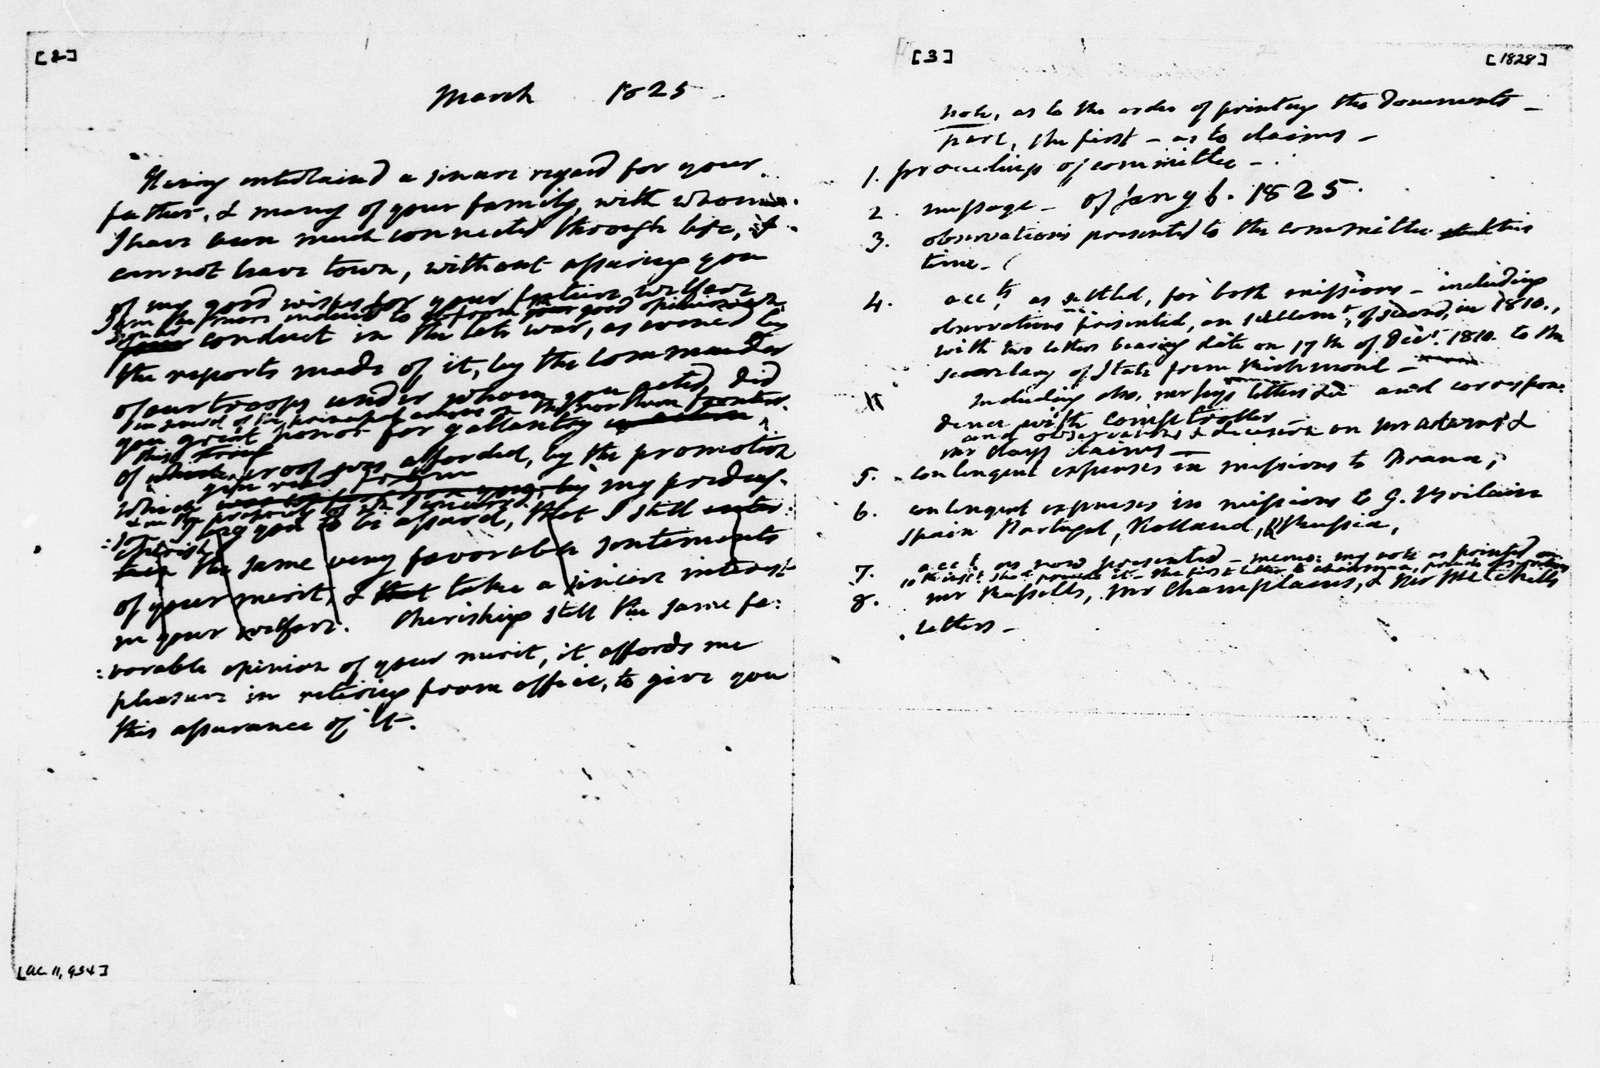 James Monroe Papers: Series 2, Additional Correspondence, 1776-1838; 1792 Oct. 20-1838 Nov. 14, undated (Reel 10)